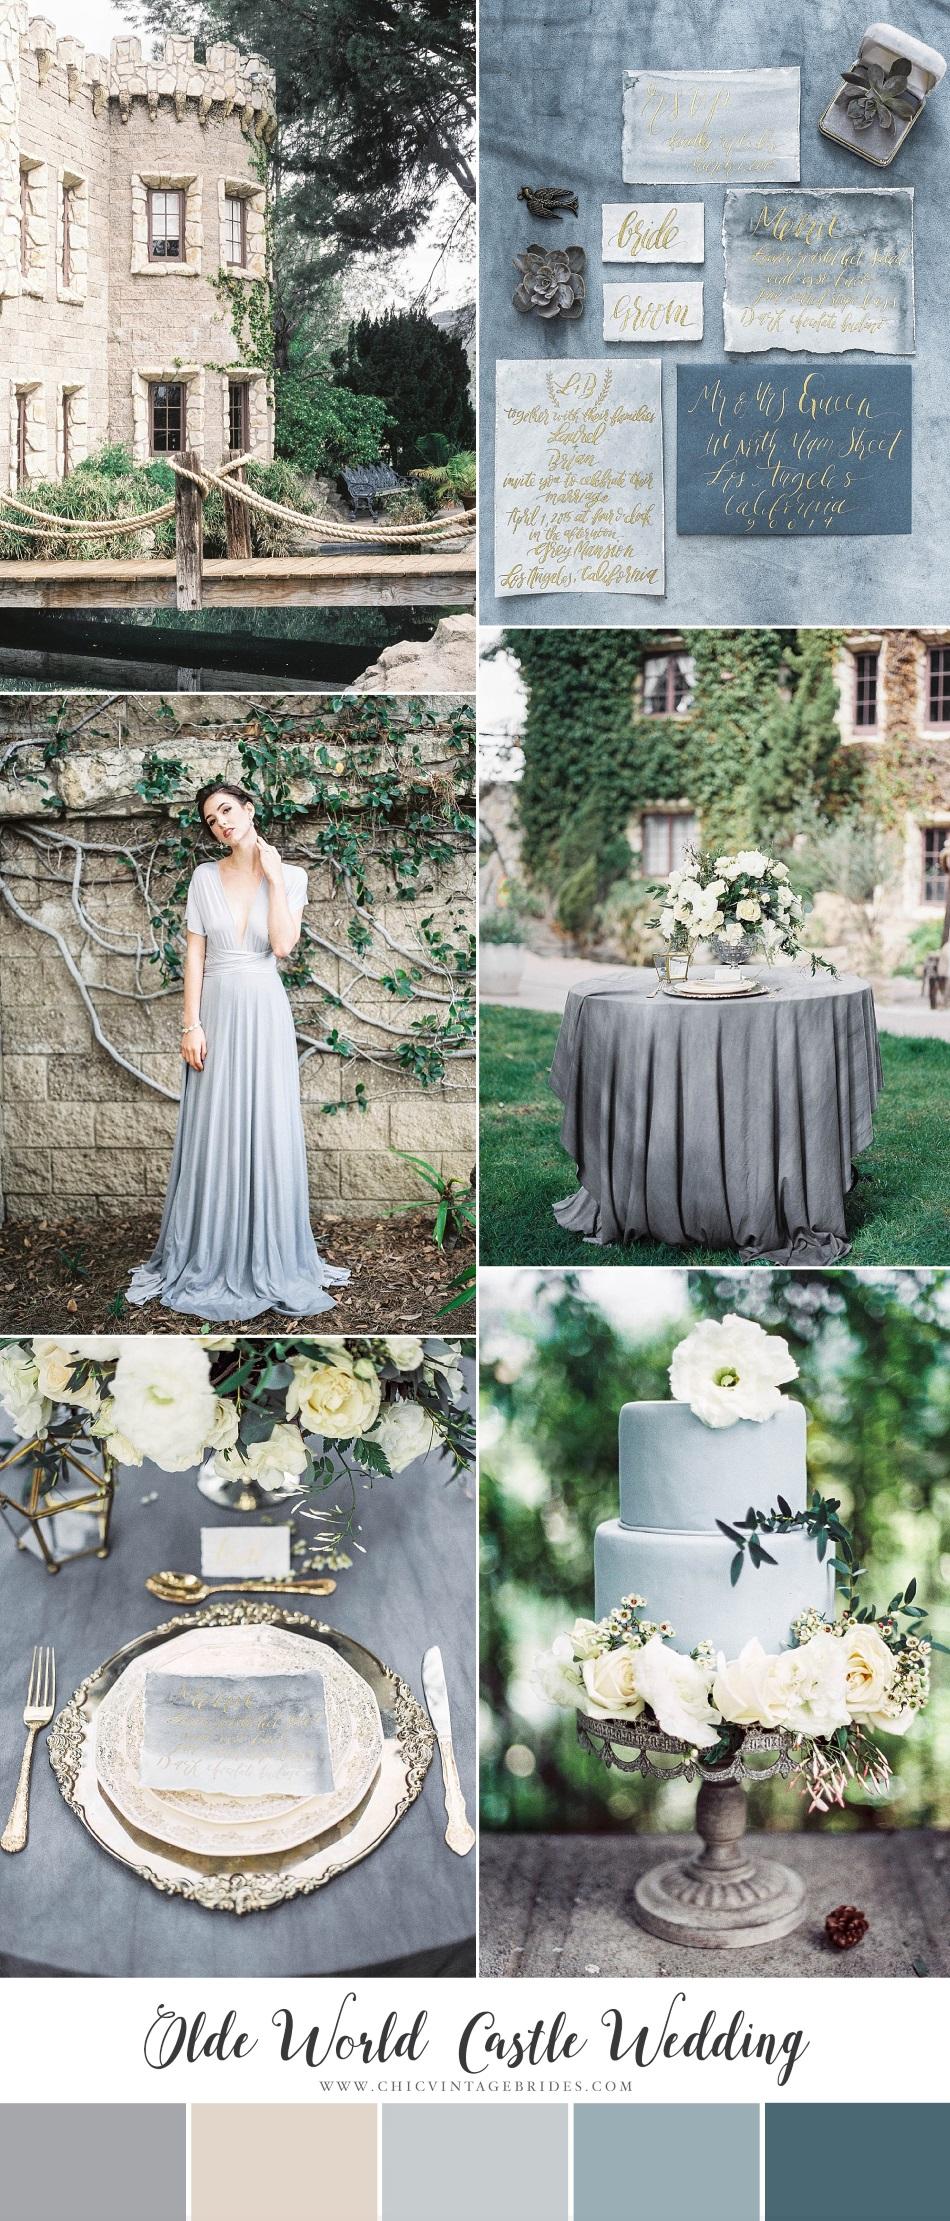 Old World Castle Wedding Inspiration